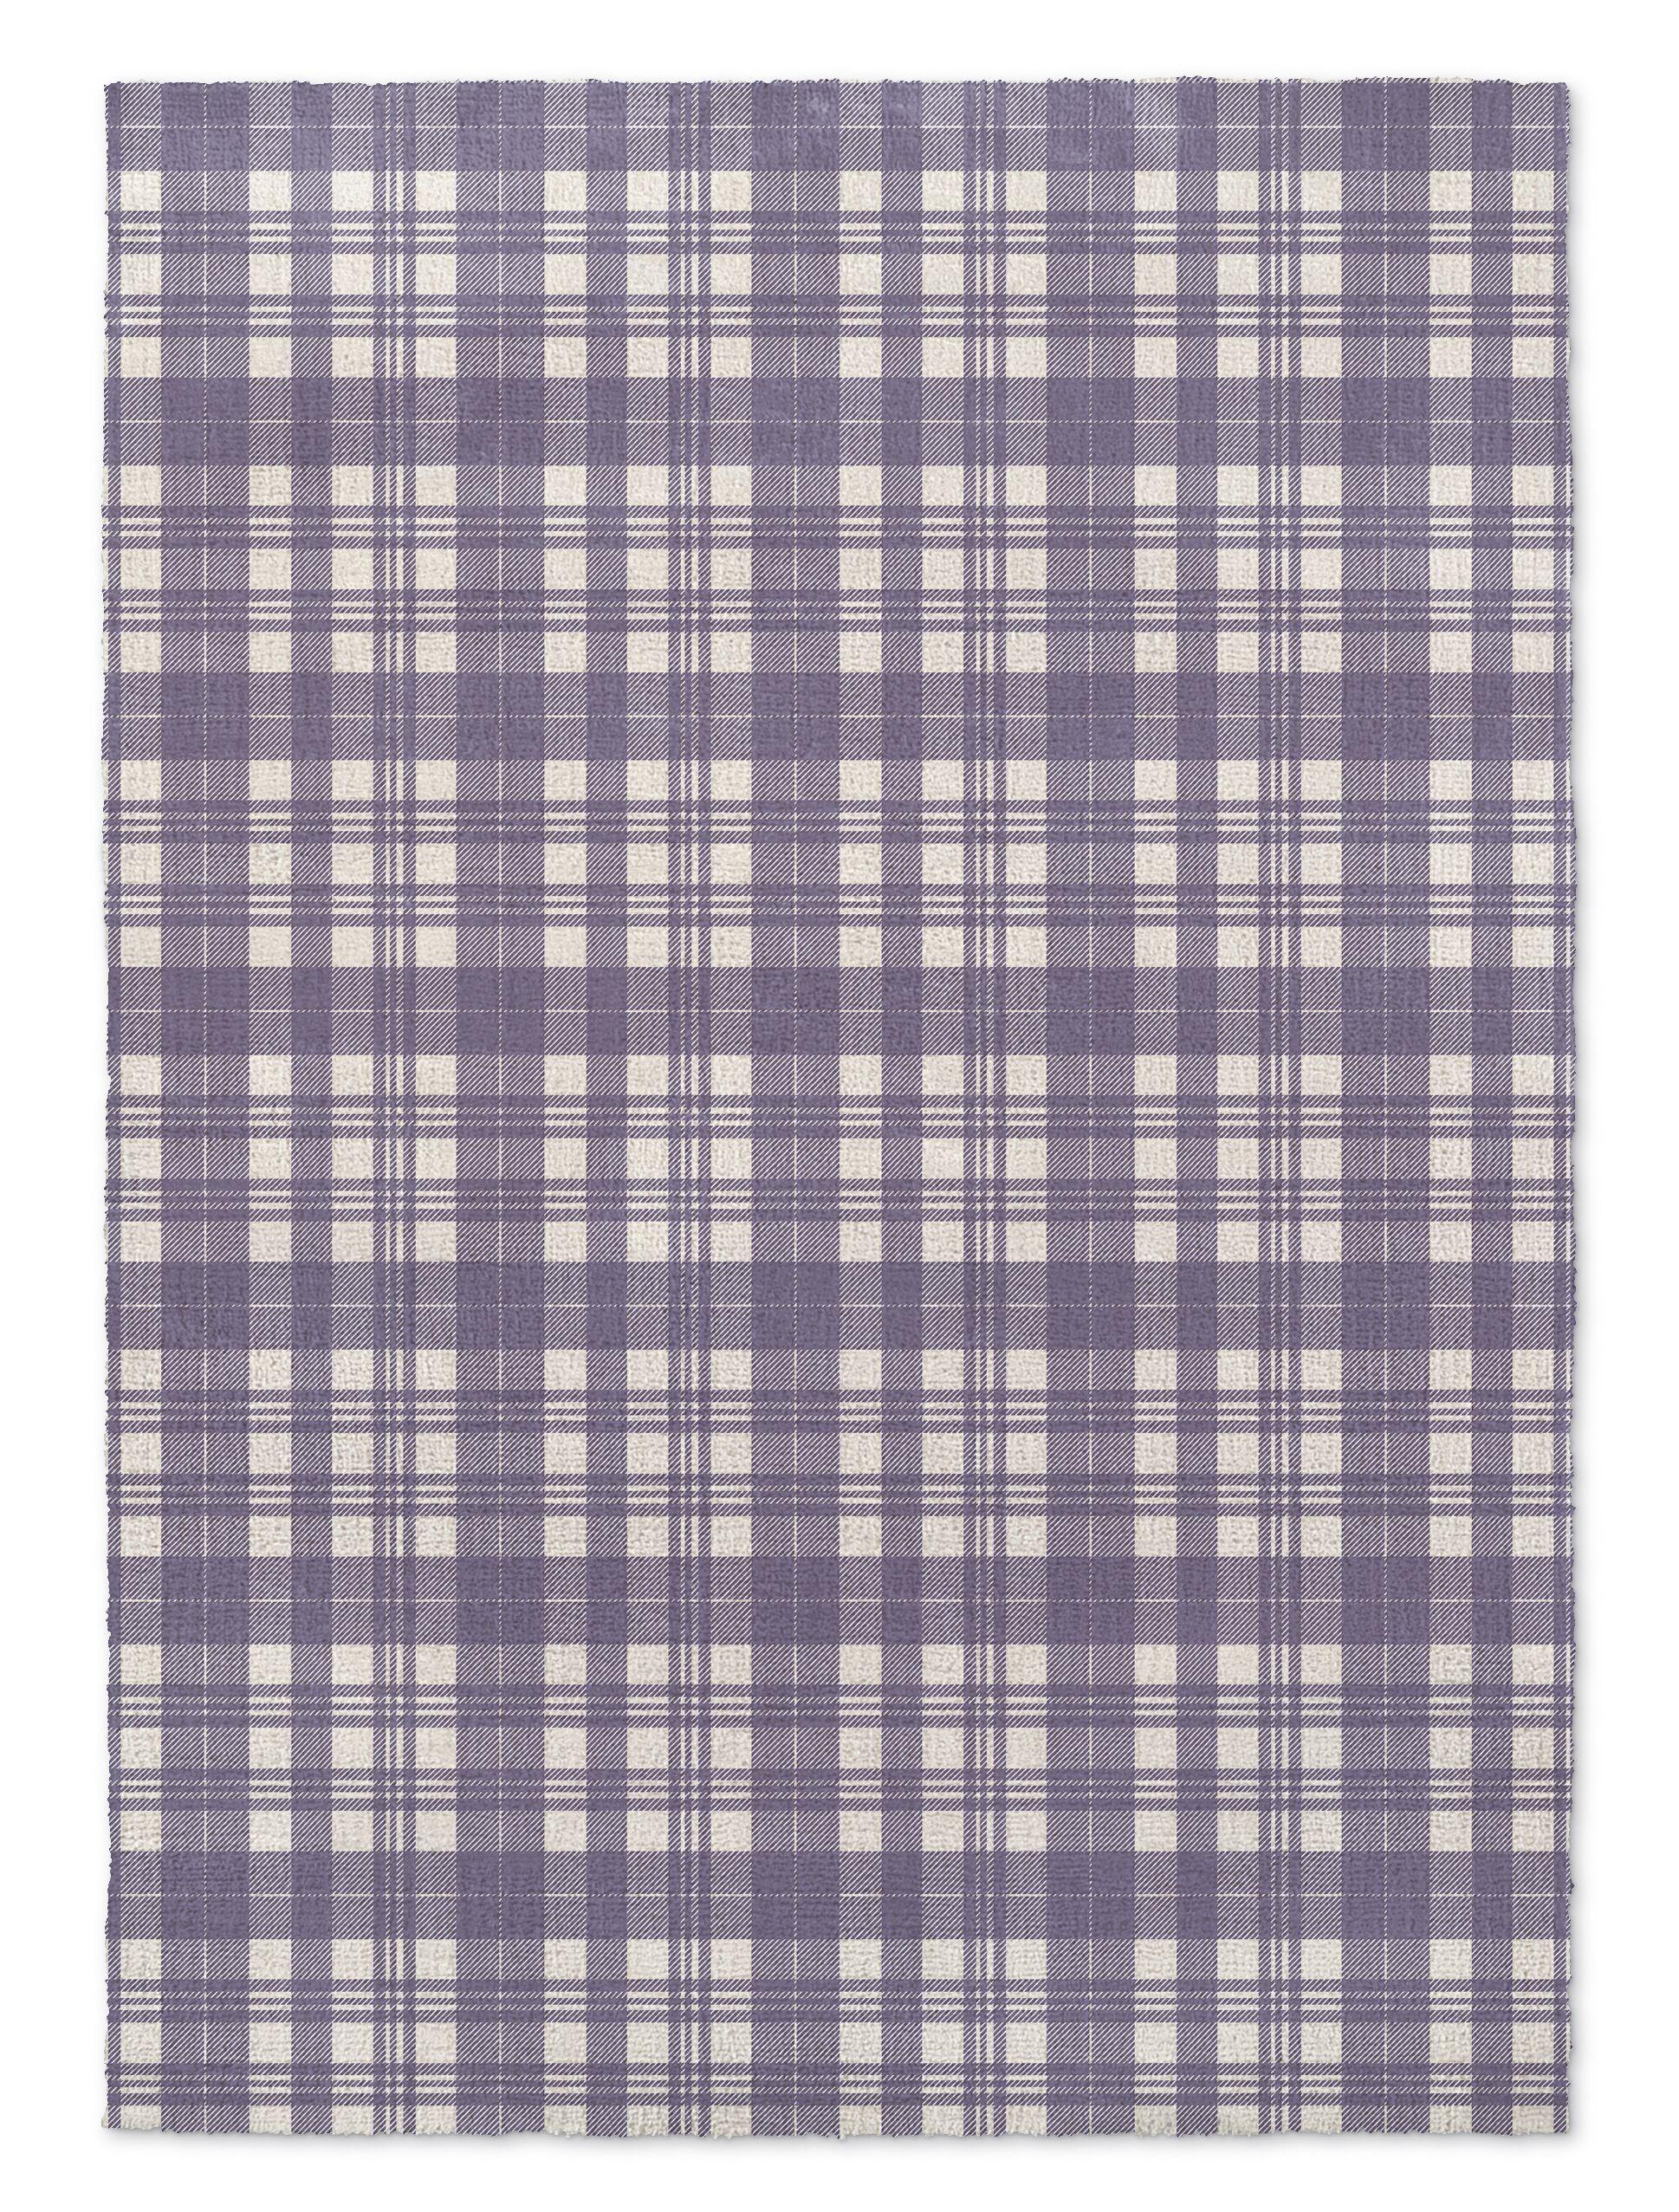 Montalto Light Purple Area Rug Rug Size: Rectangle 5' x 7'